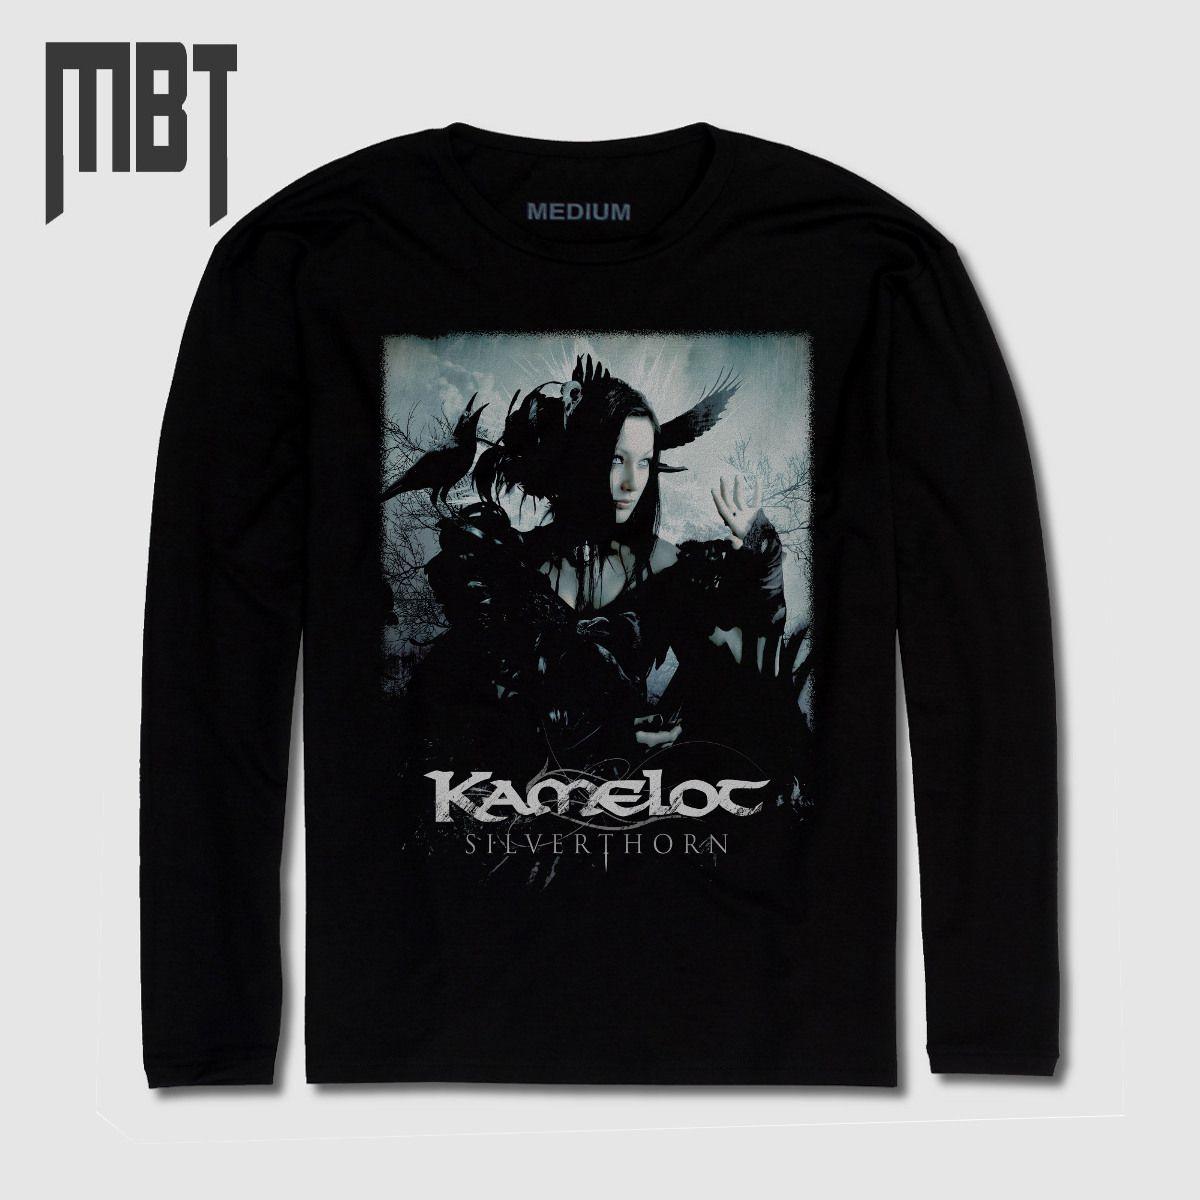 Kamelot Band Long Sleeve T Shirt Kamelot Silver Thorn Cover Long Sleeve Tee Shirt Power Metal Merch Metal Merch T Shirts Metal Merchandise T Shirts